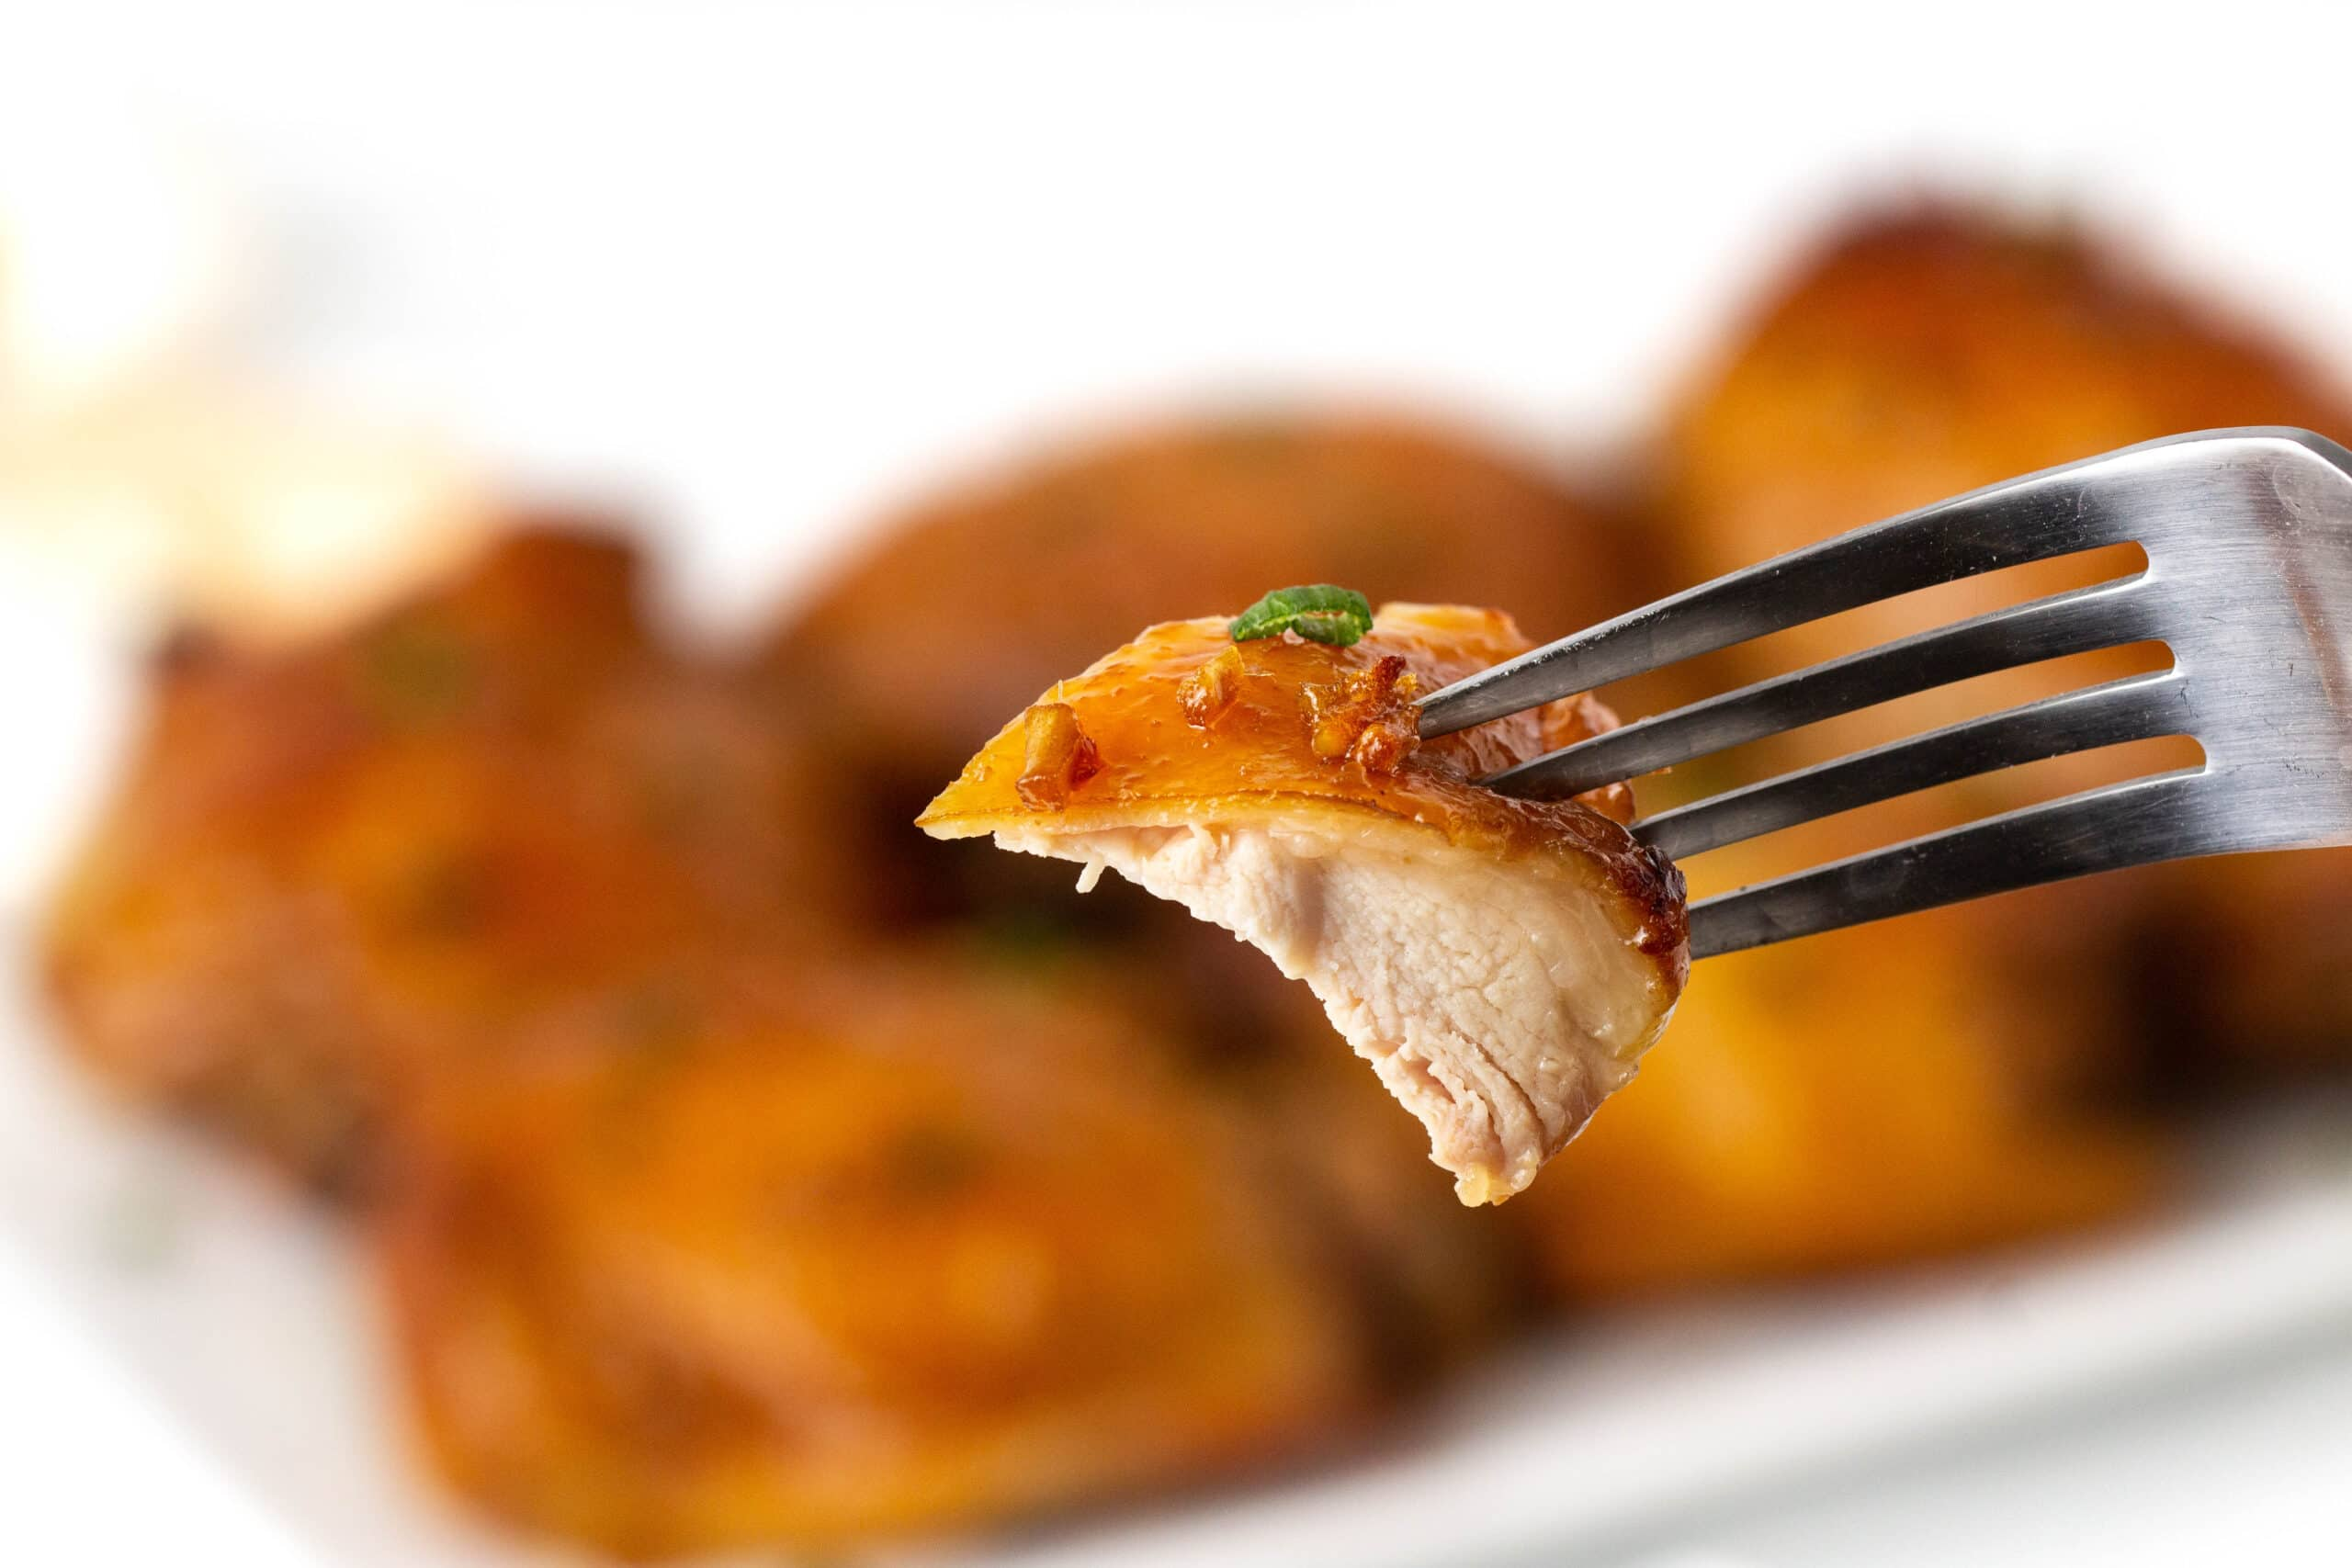 Honey Garlic Chicken on a fork